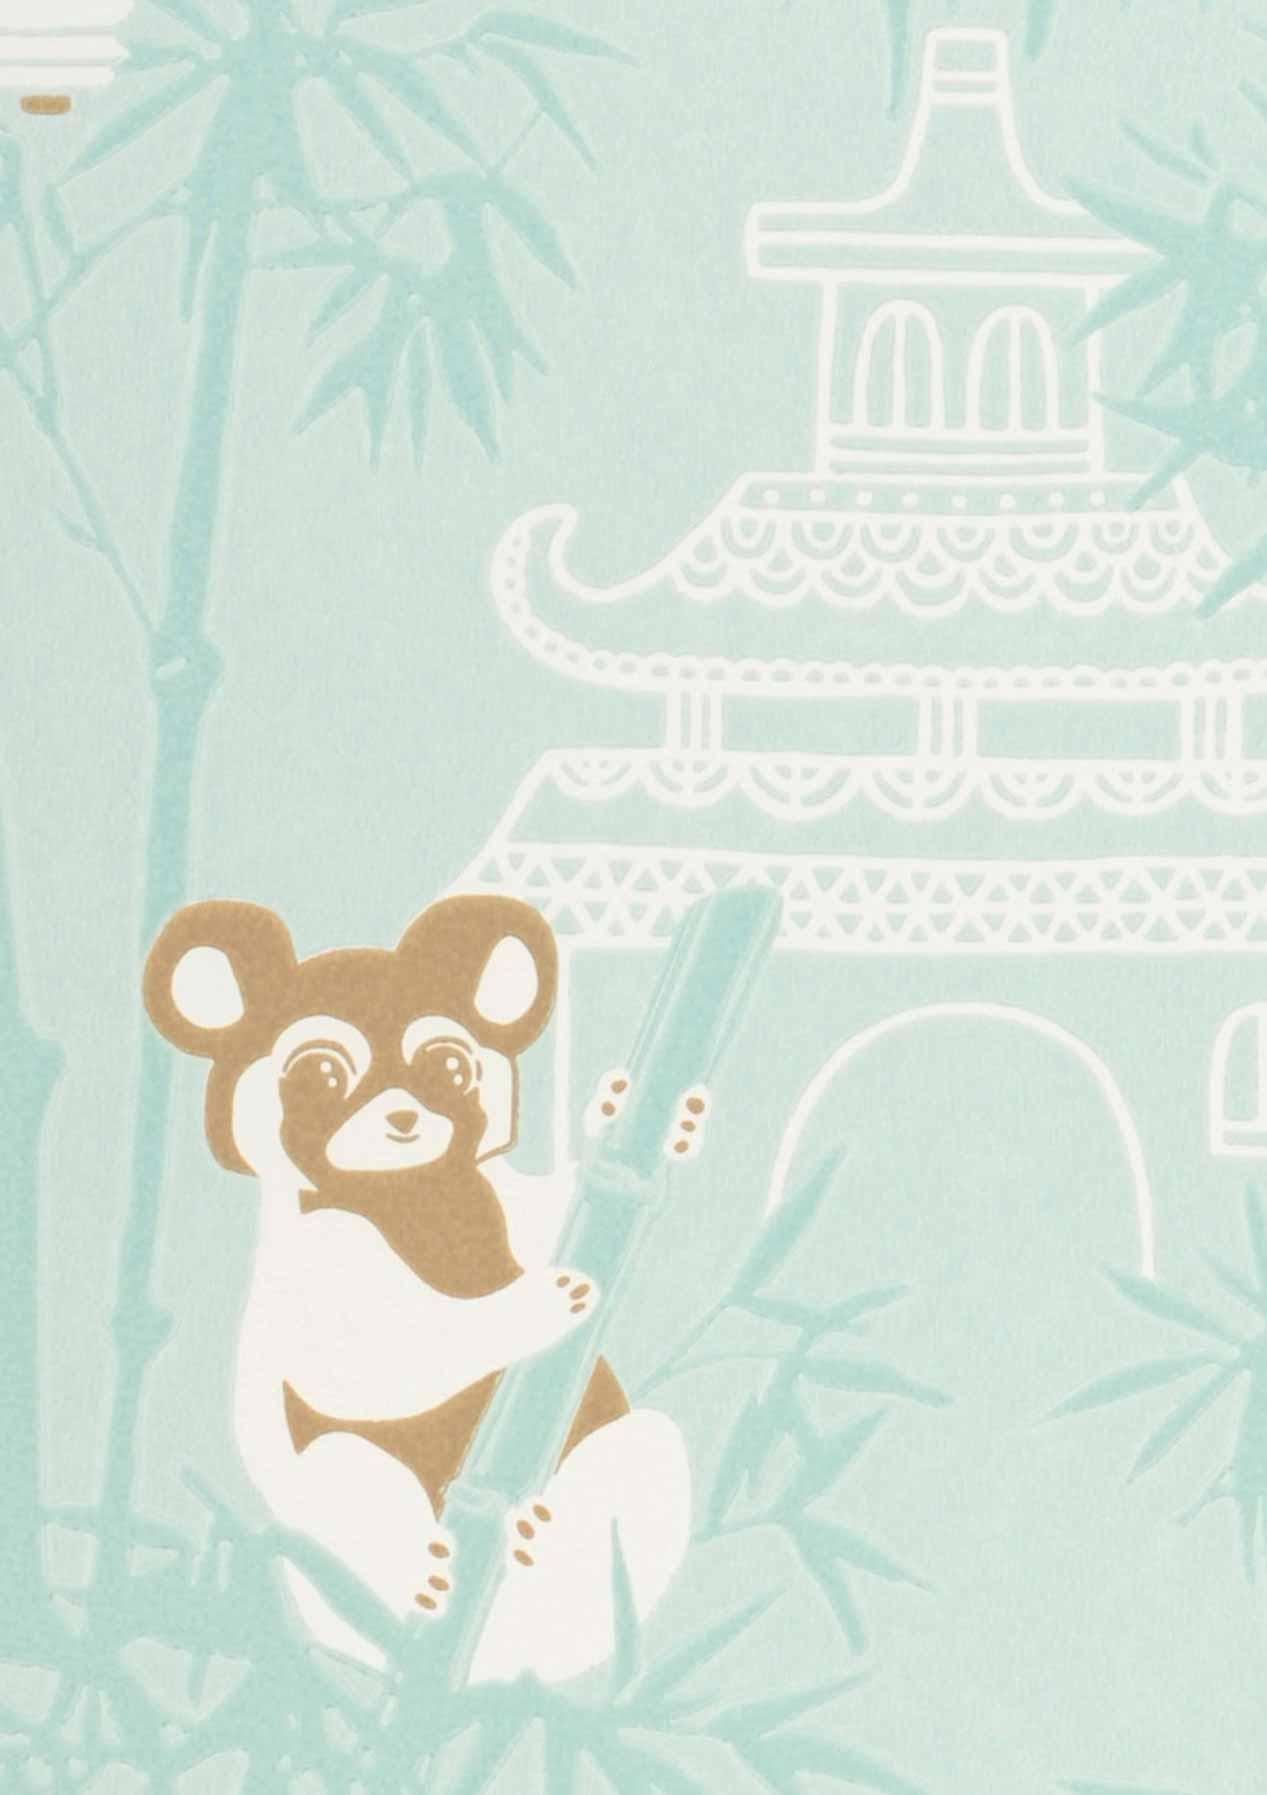 Papel pintado bambu turquesa pastel blanco crema for Papel pintado turquesa y marron